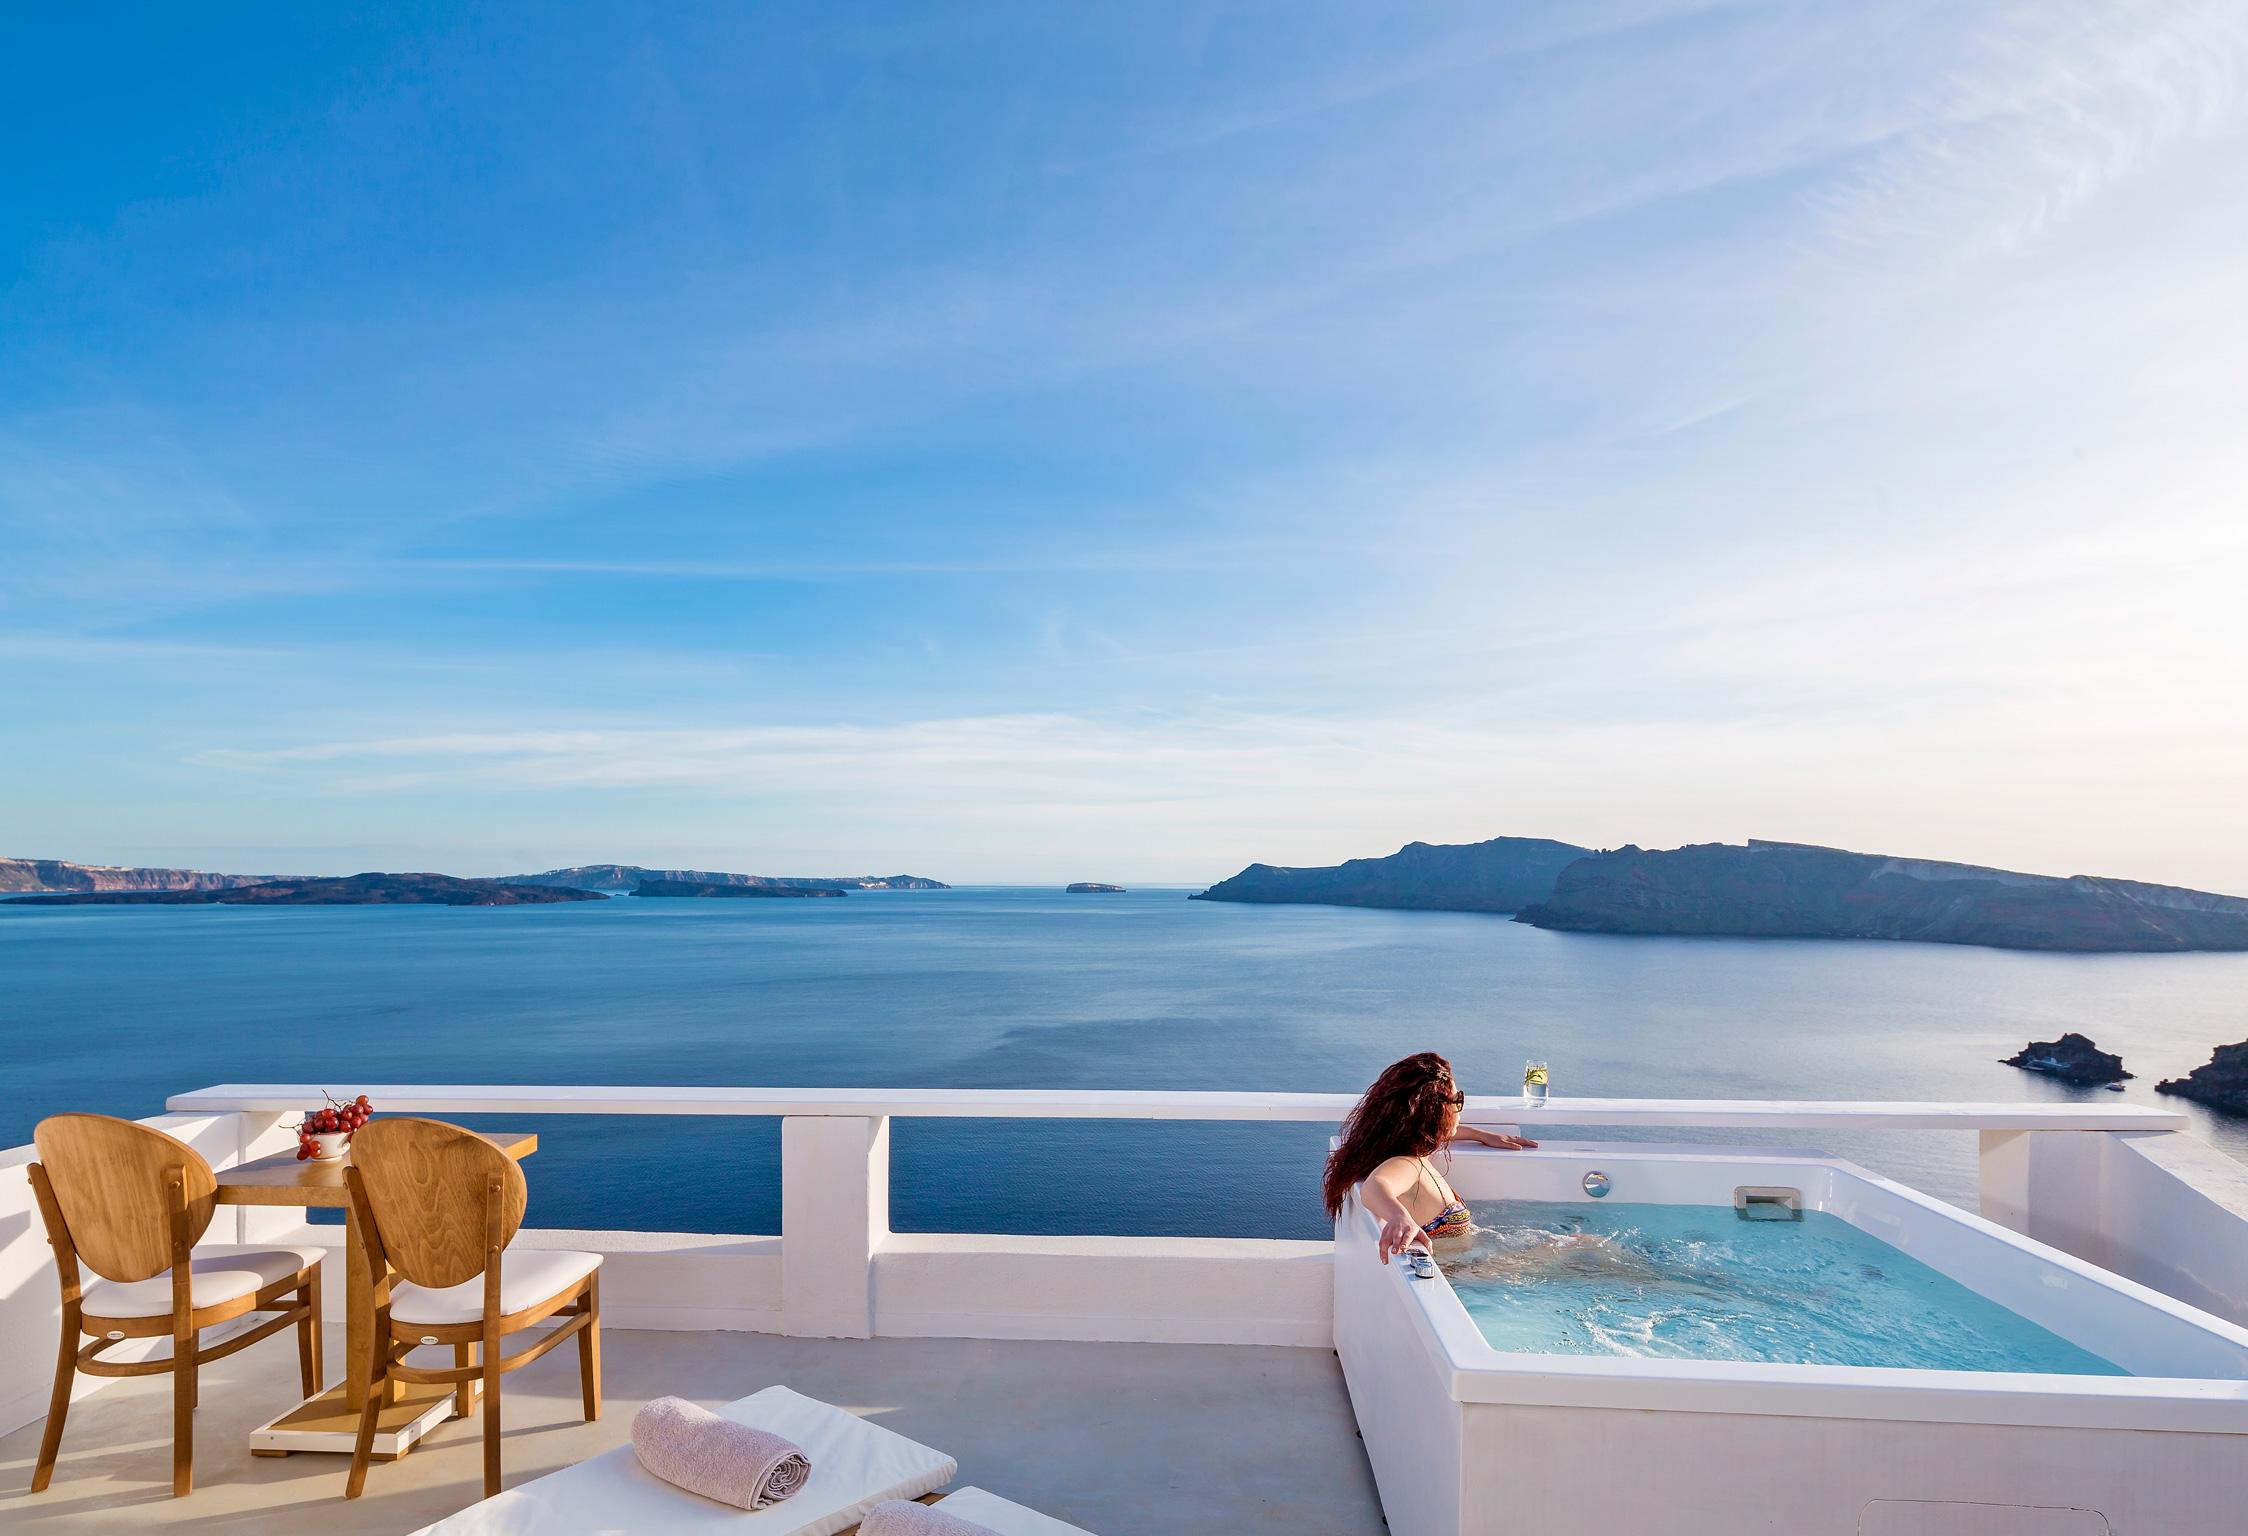 Santorini Villa Thais Pure jumbotron image